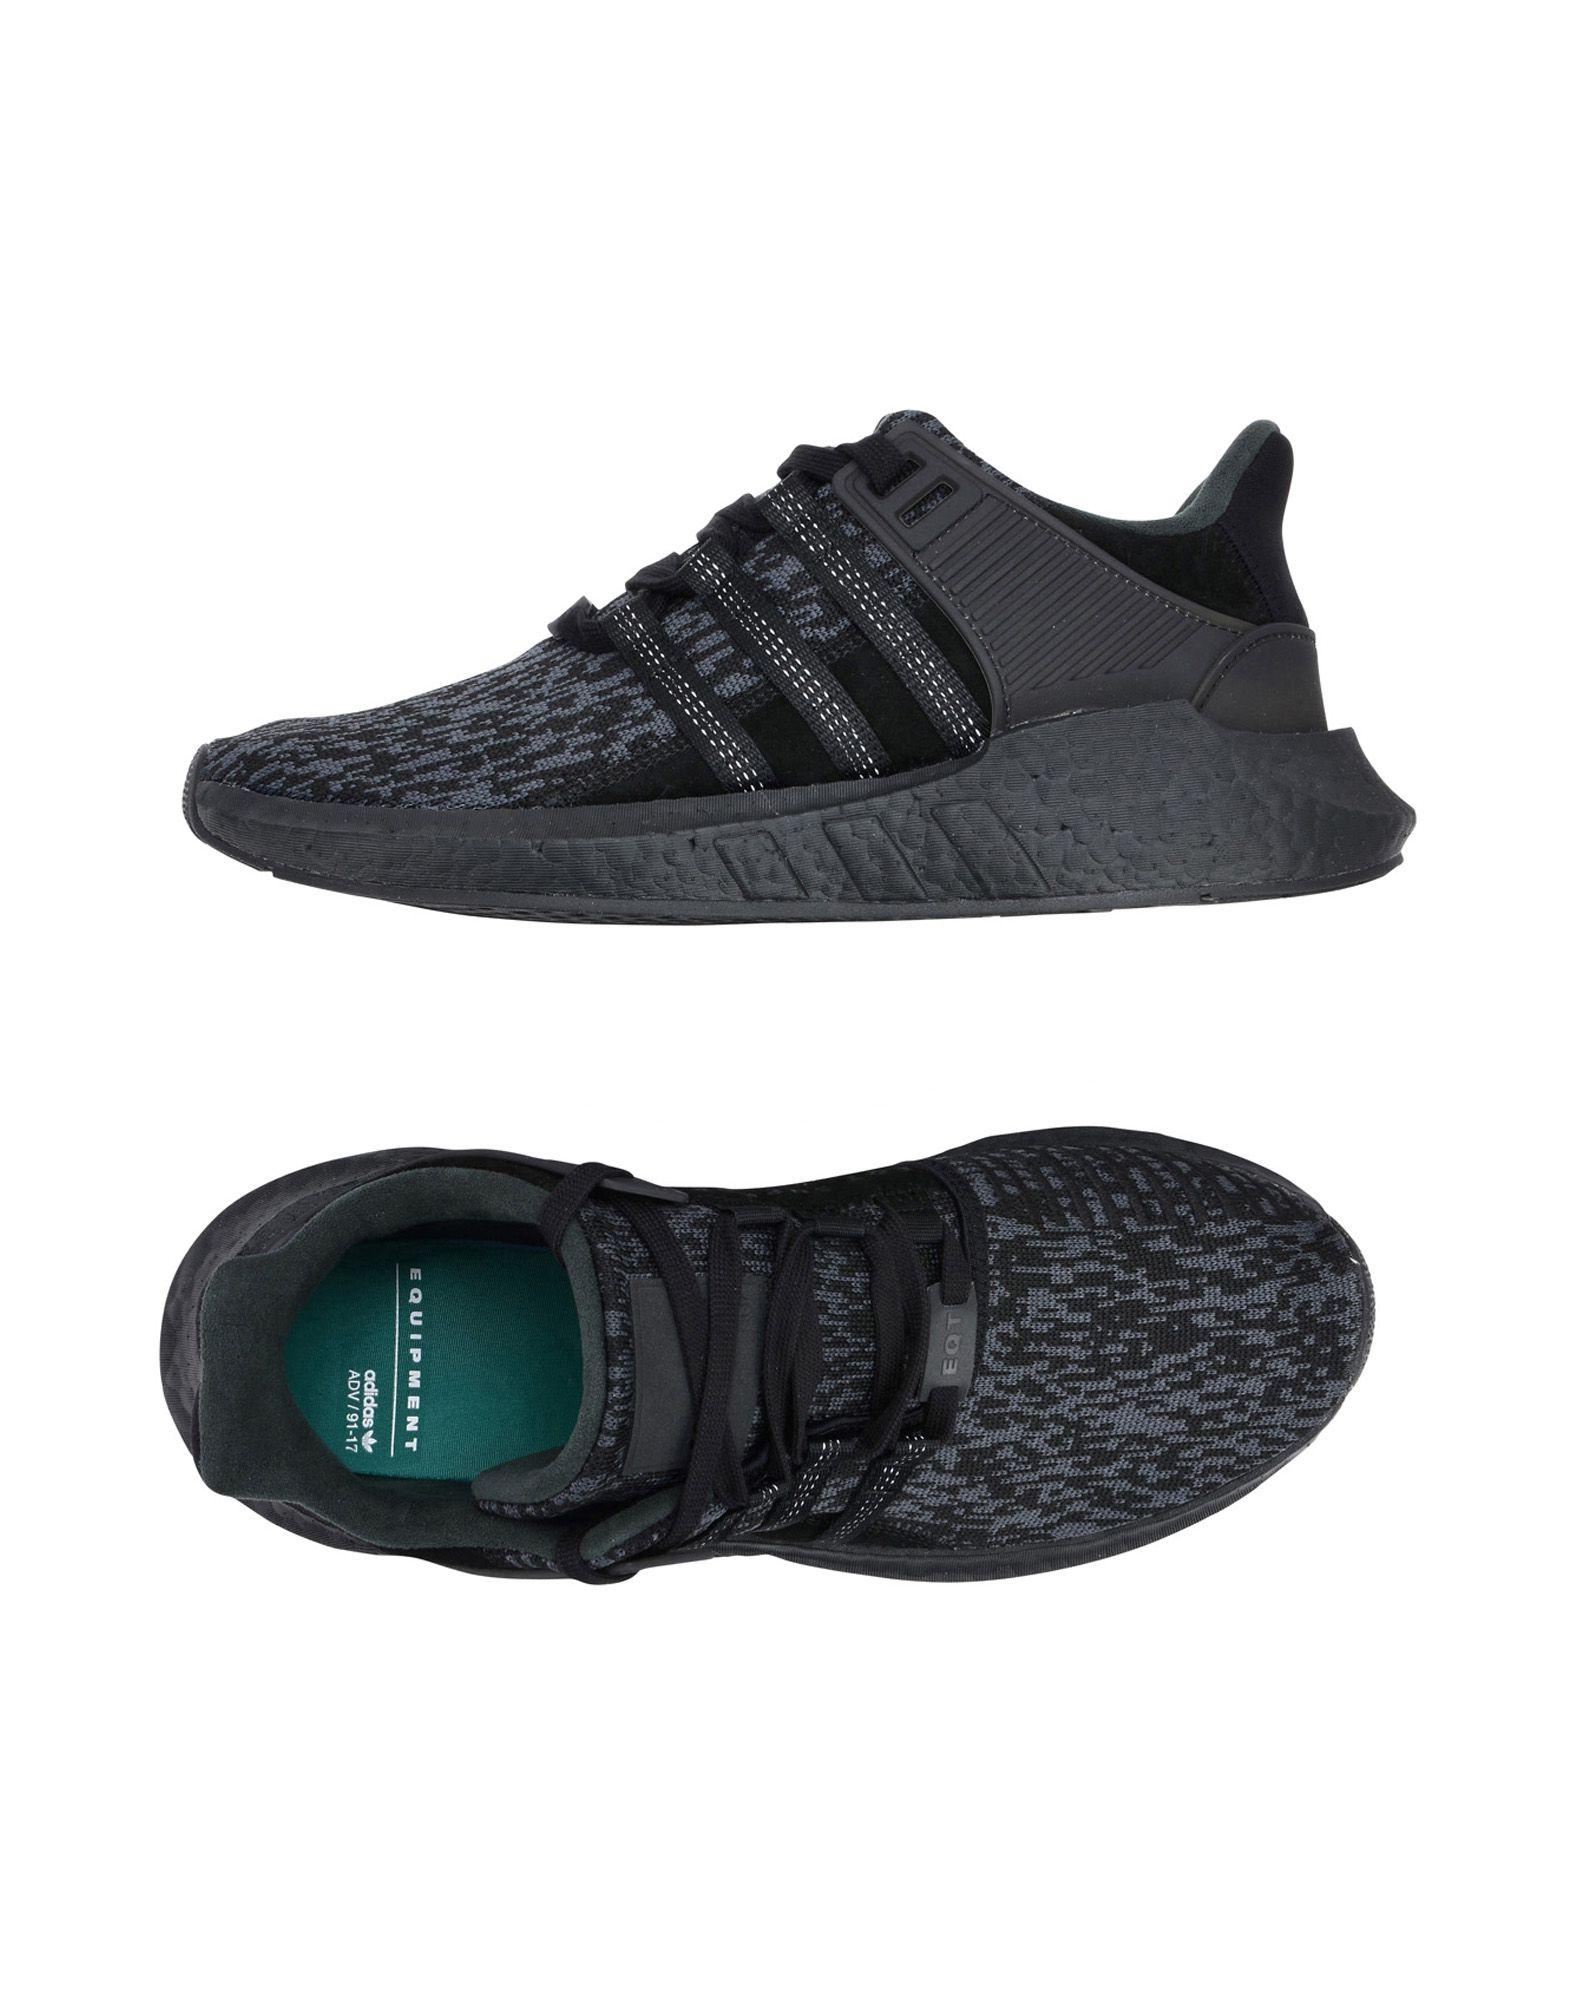 Baskets Adidas Originals Eqt Support 93 17 - Homme - Baskets Adidas Originals  Noir Meilleur modèle de vente